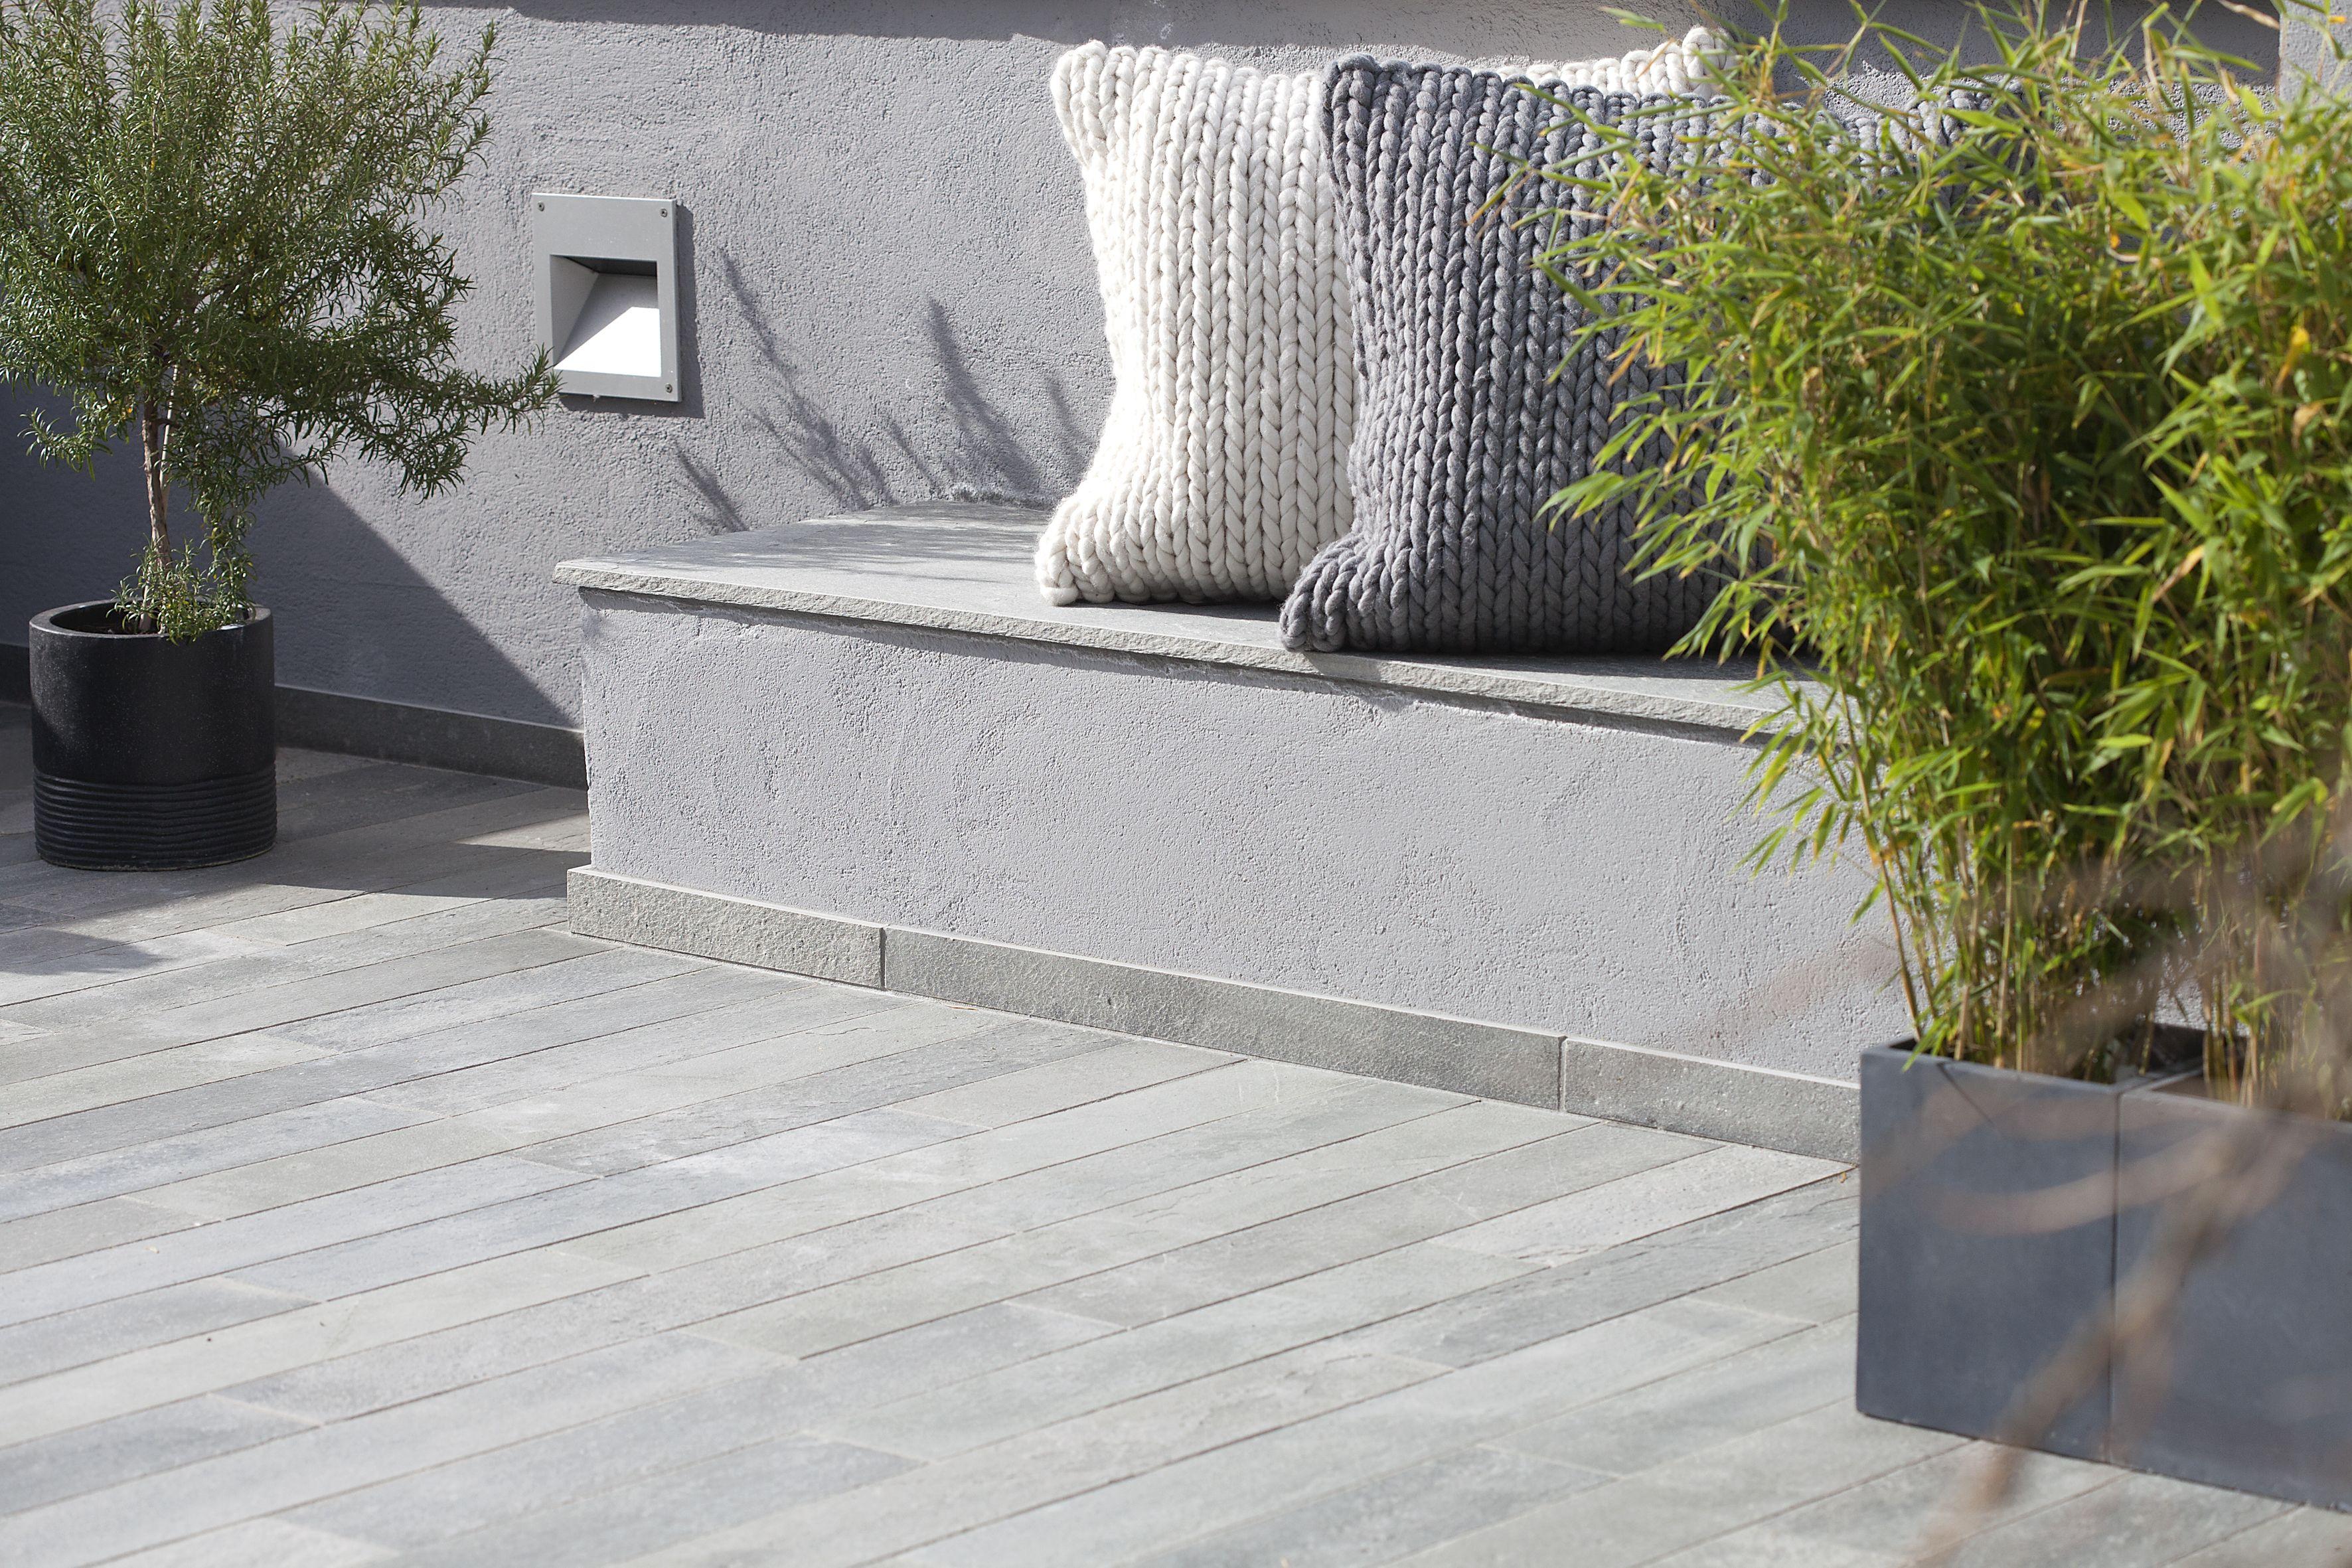 terrasse i 20 cm brede fliser av lys oppdalsskifer fra minera skifer pinterest garden. Black Bedroom Furniture Sets. Home Design Ideas